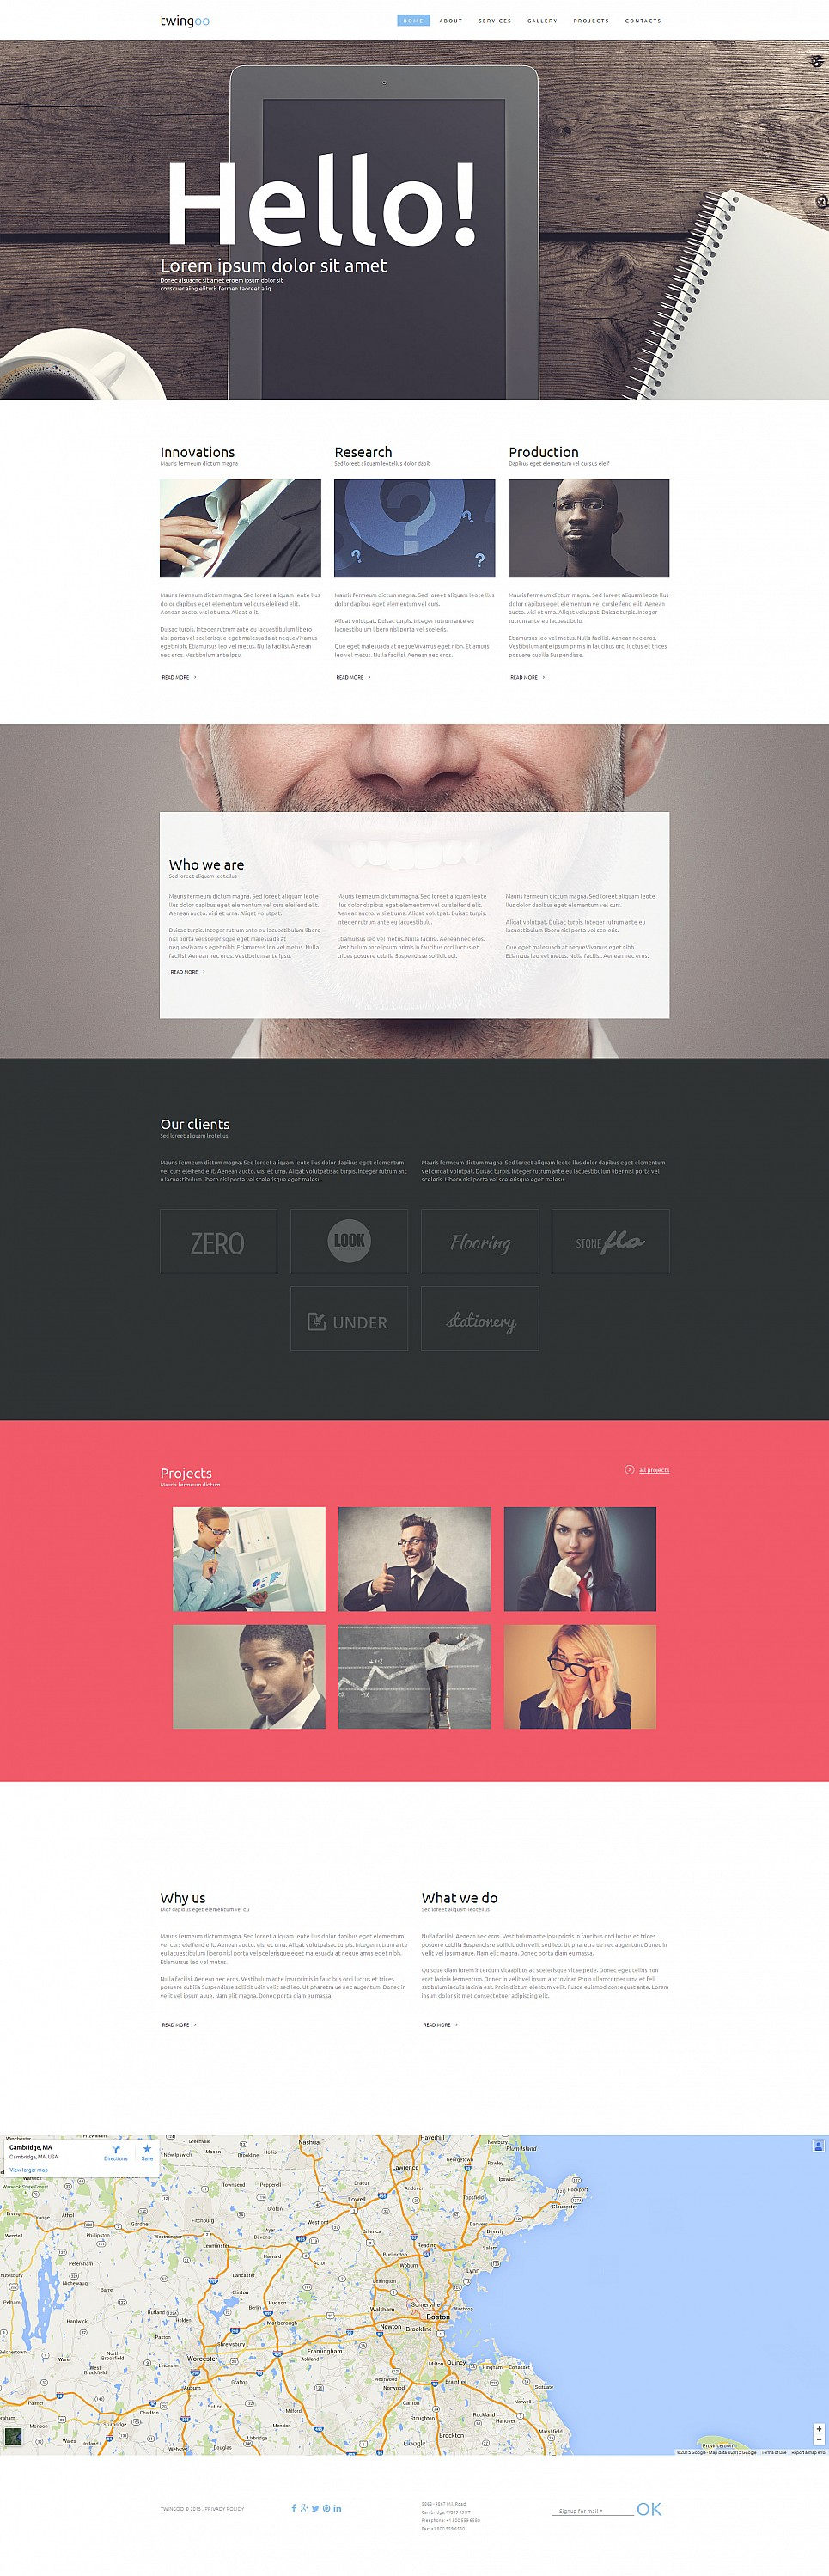 Responsive Business Site Theme - image